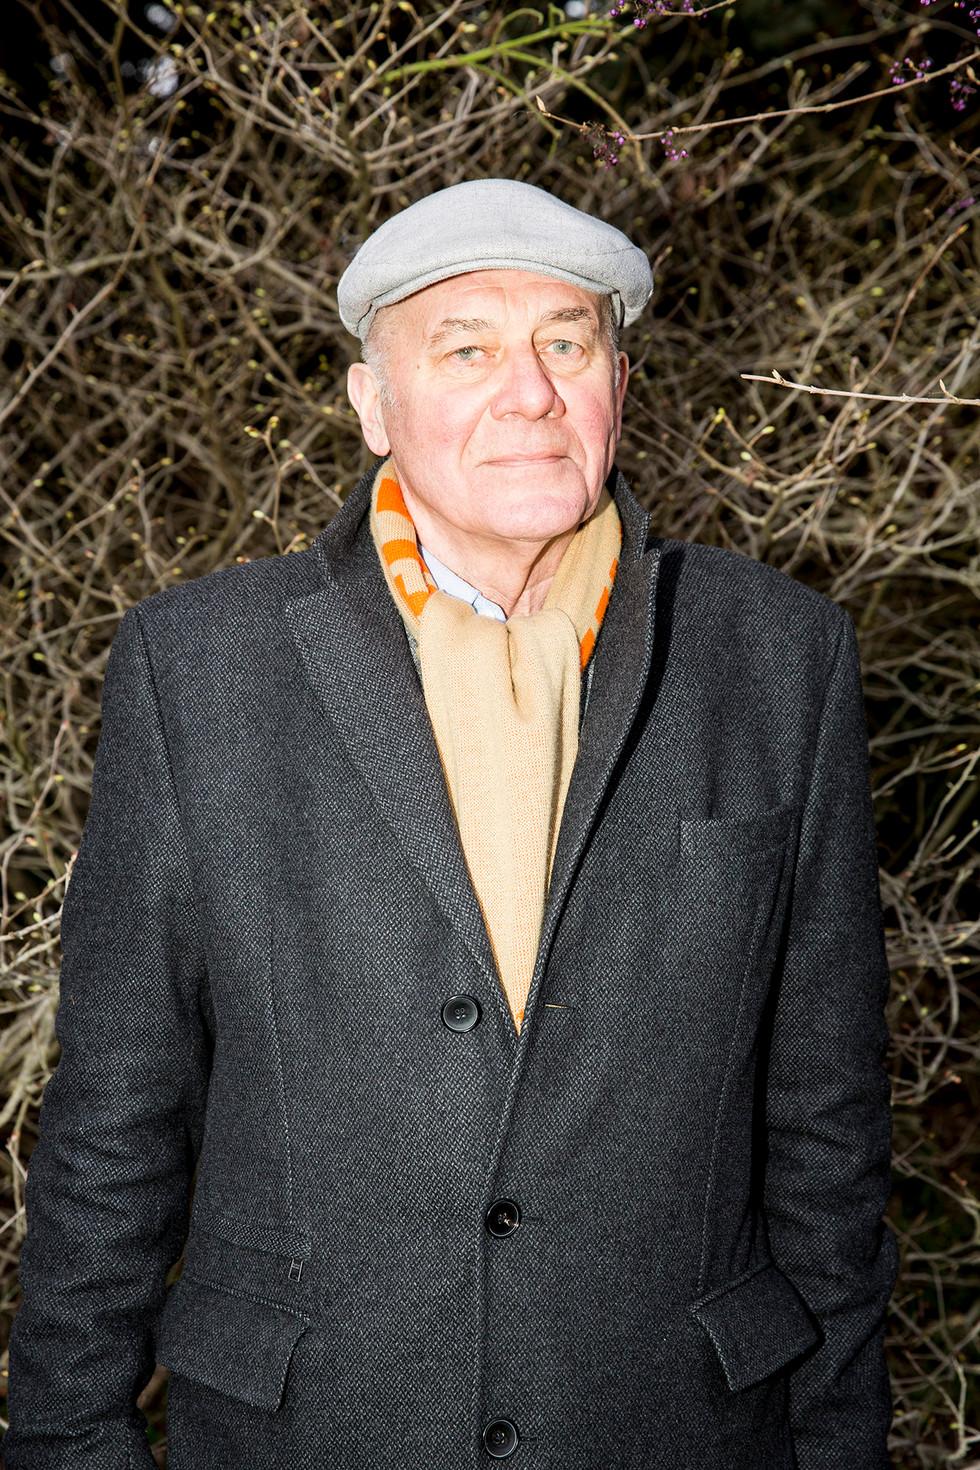 Hanns Zischler